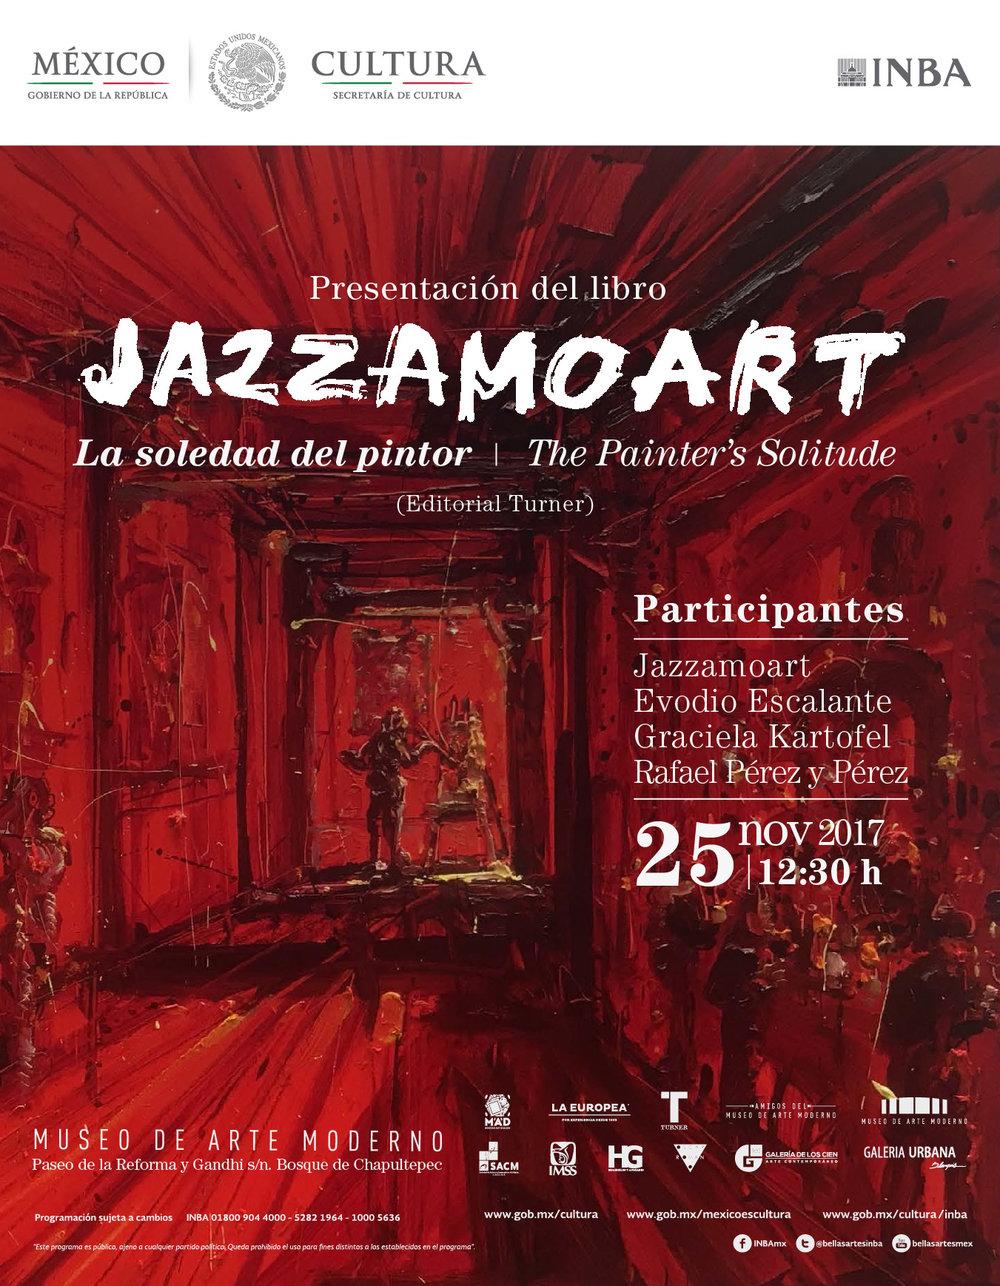 INV_jazzamoart-01-3.jpg